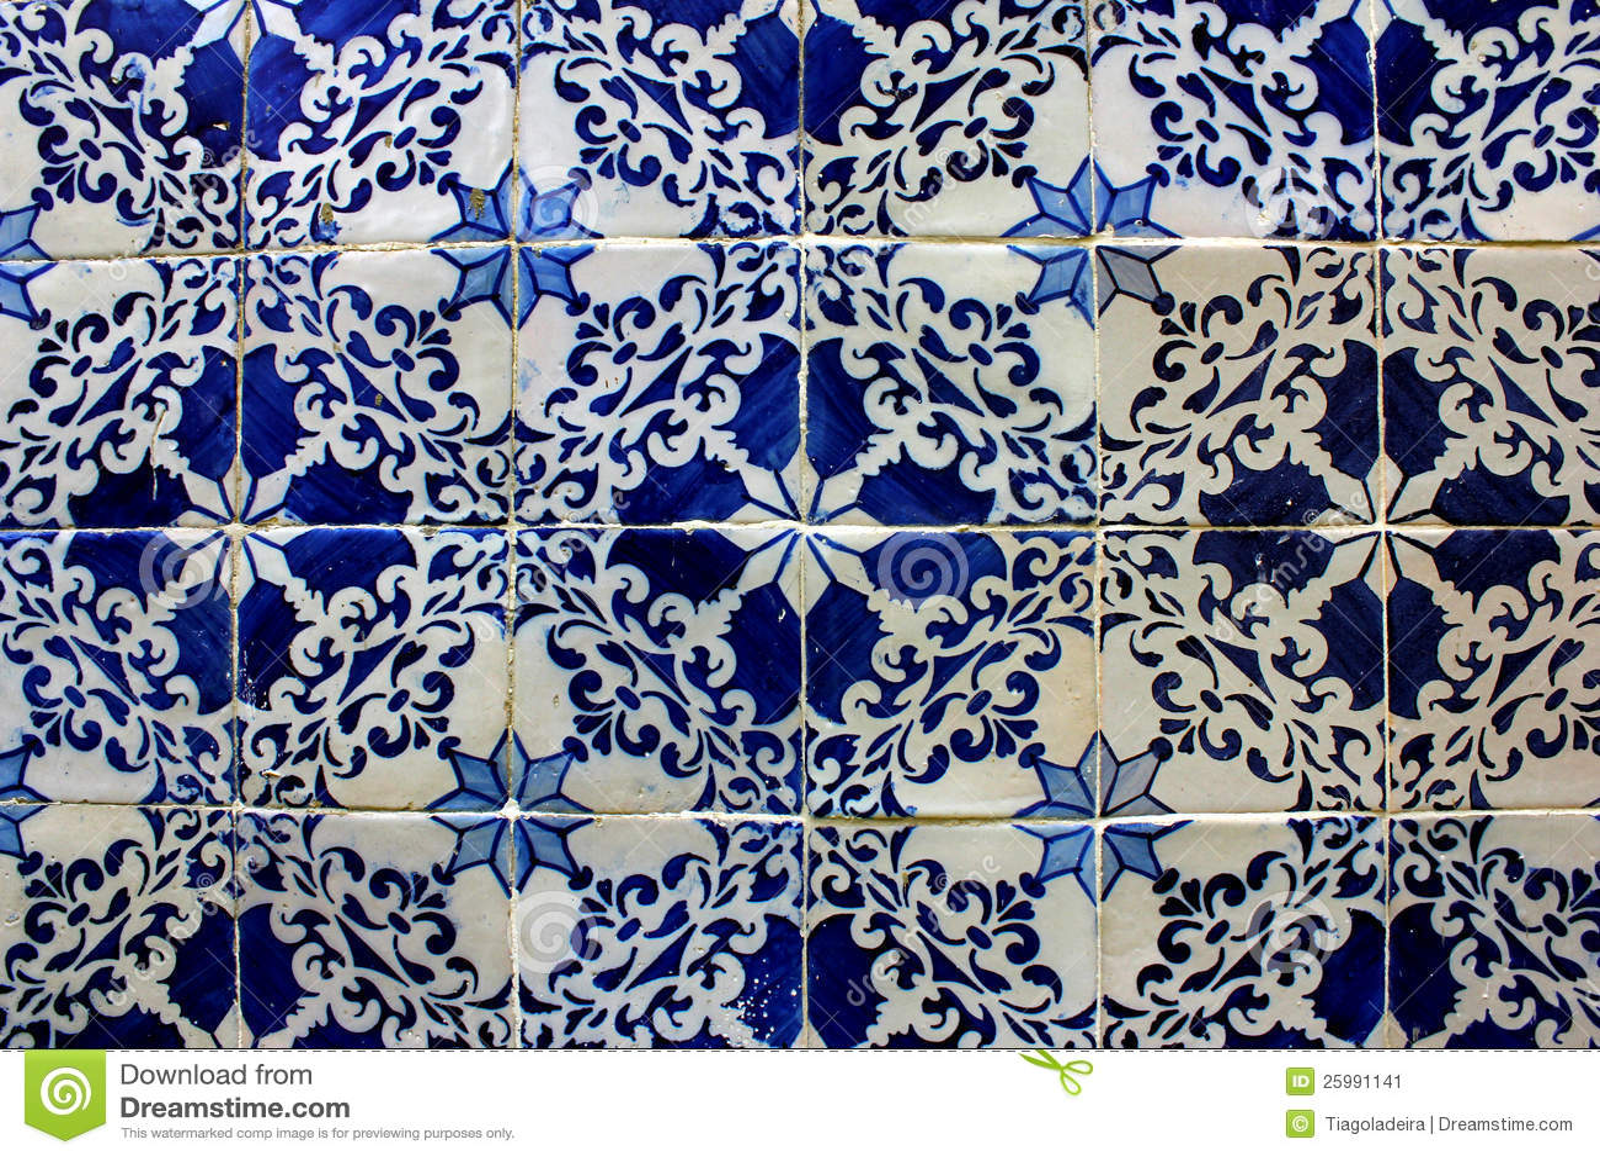 Blue And White Tiles Lisbon Portugal Stock Image Image